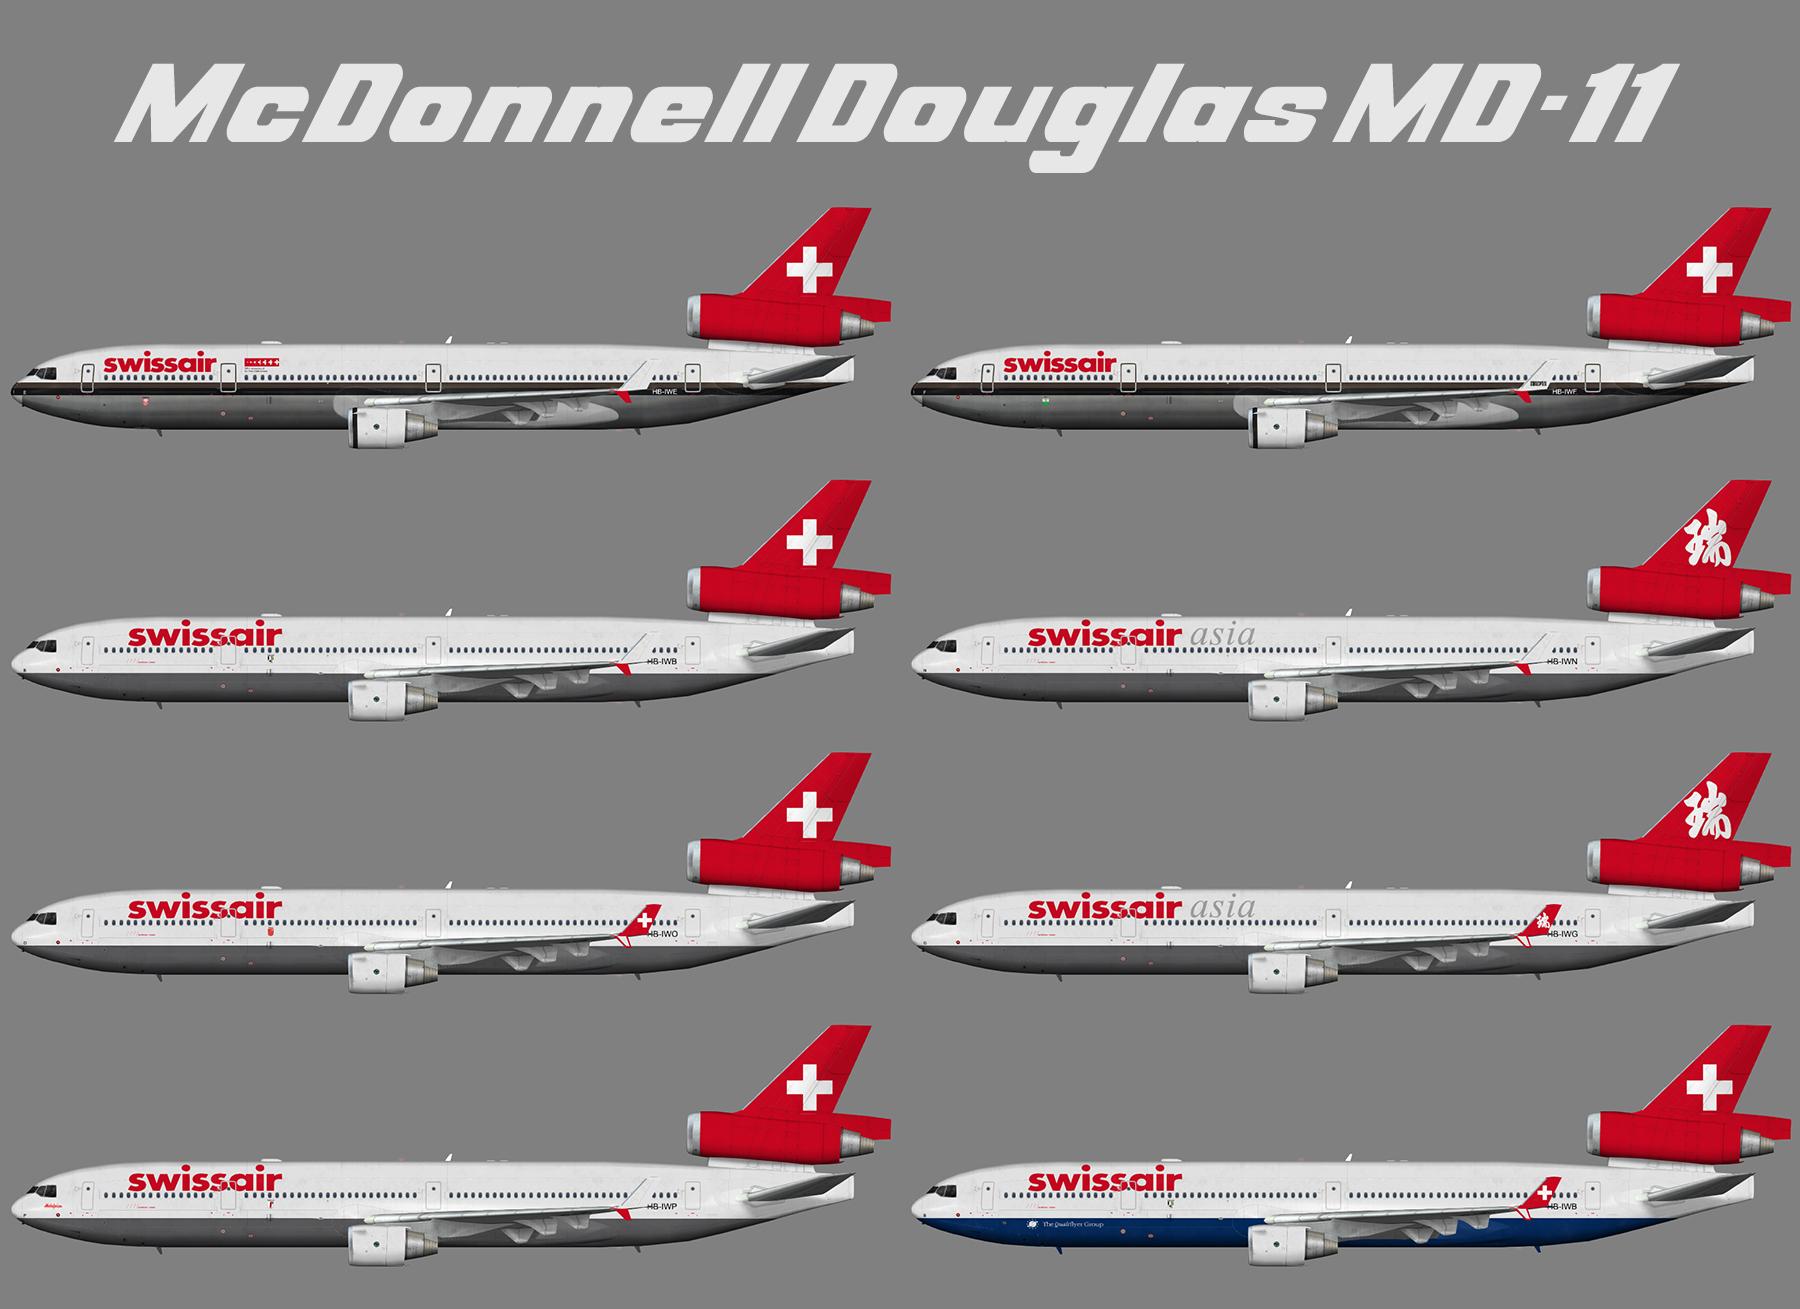 Swissair McDonnell Douglas MD-11